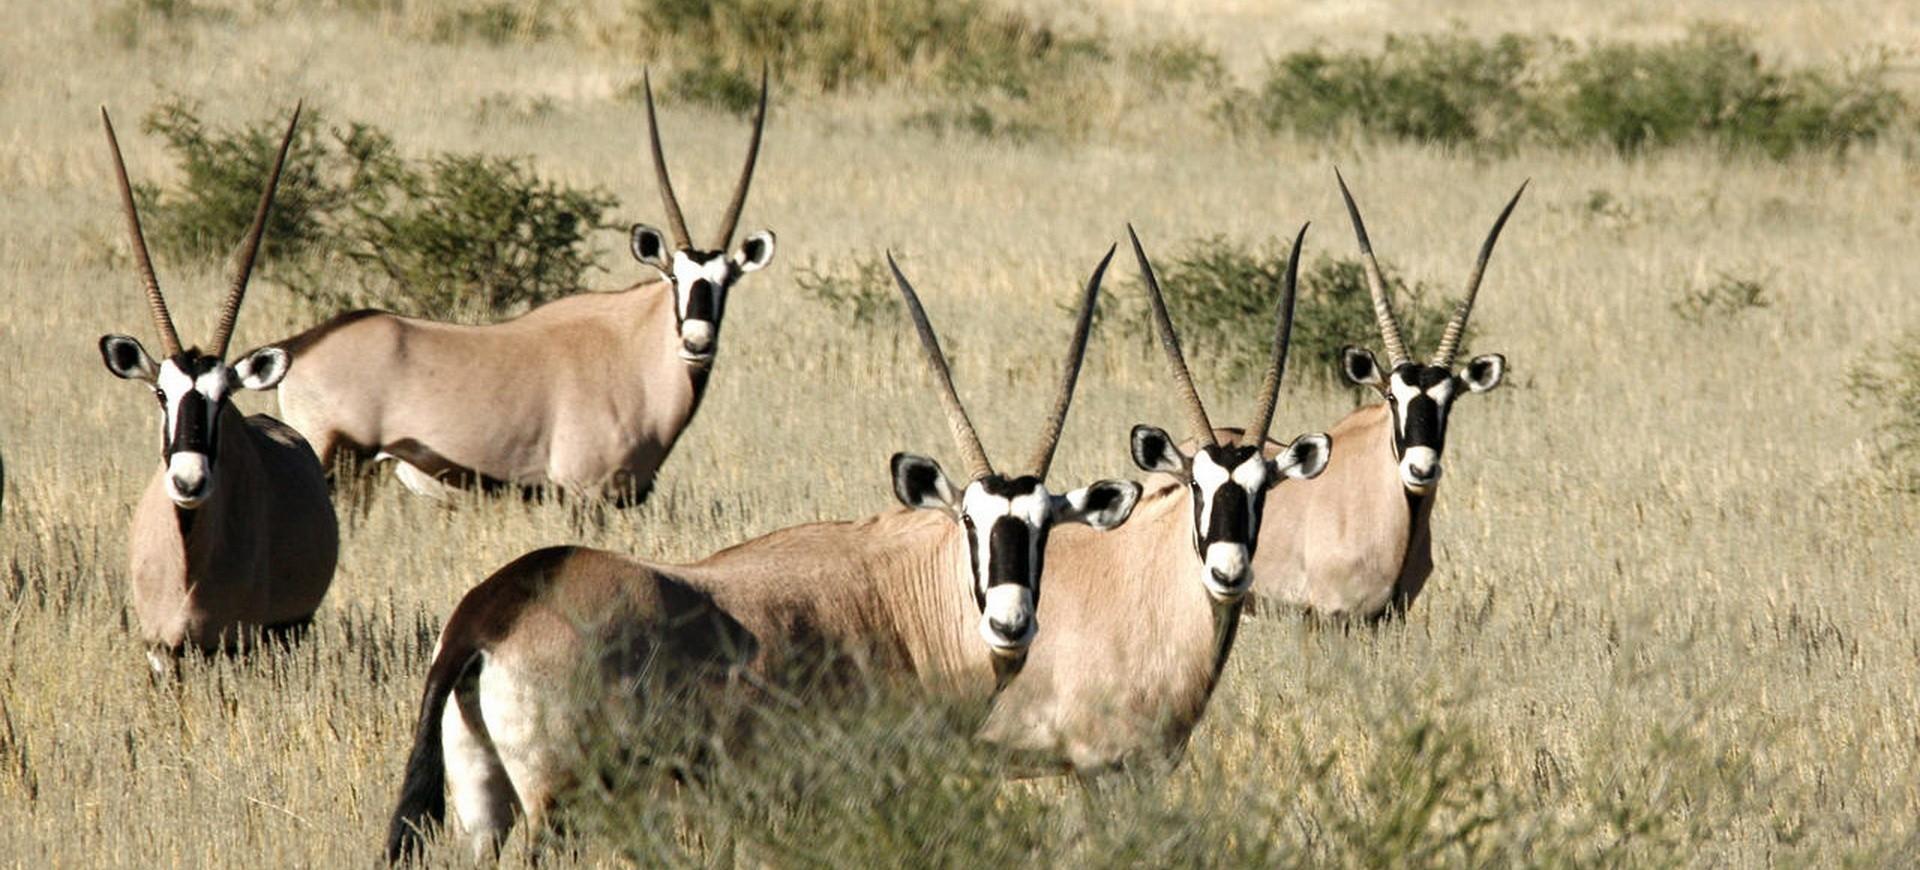 Namibie Etosha Réserve d'animaux